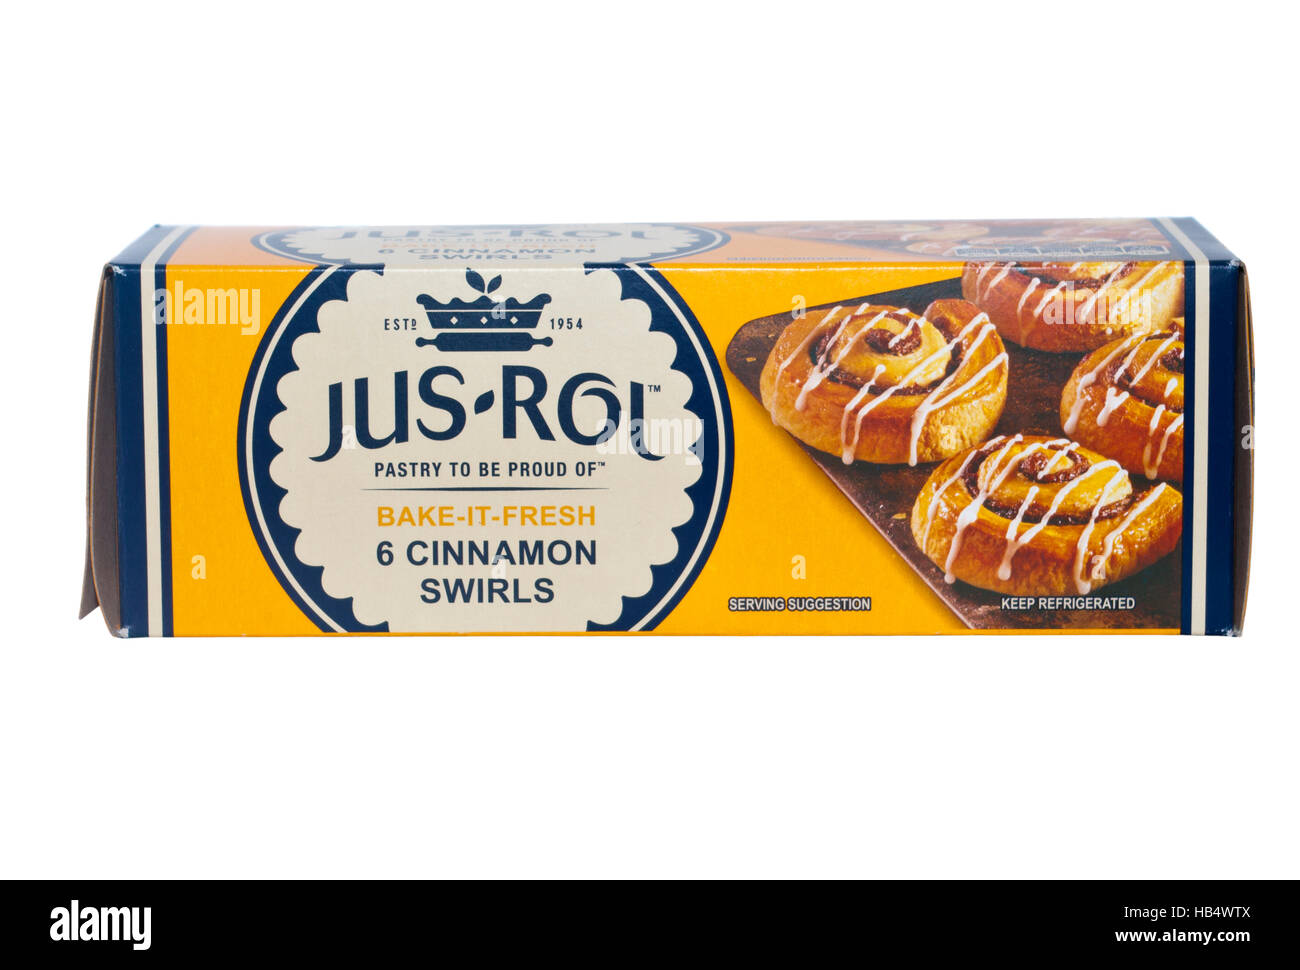 Box Of Jus Rol Bake It Fresh 6 Cinnamon Swirls Pastries - Stock Image